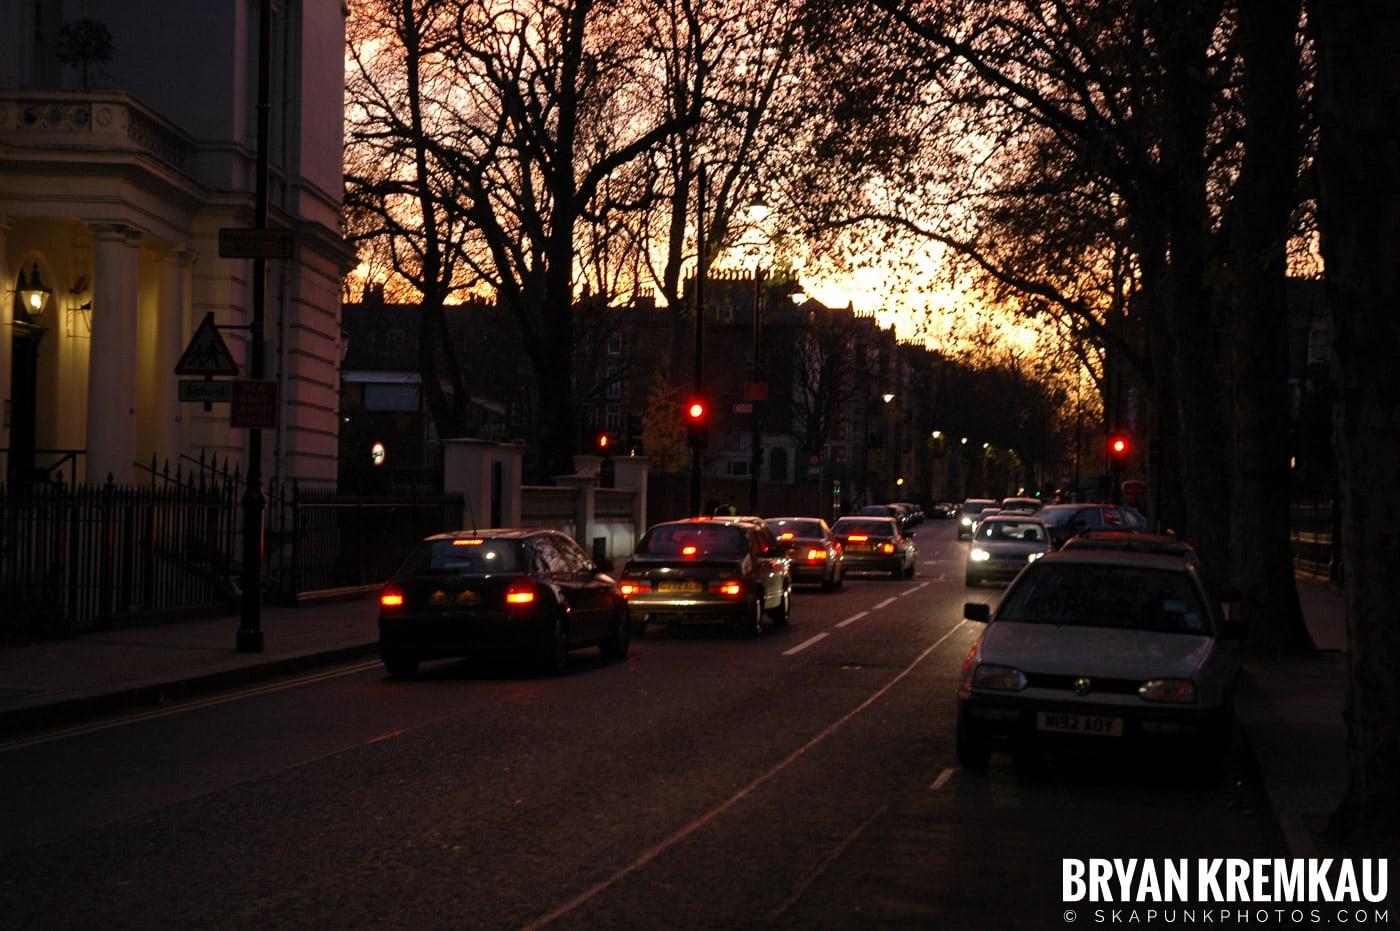 London, England - Day 2 - 12.17.05 (3)